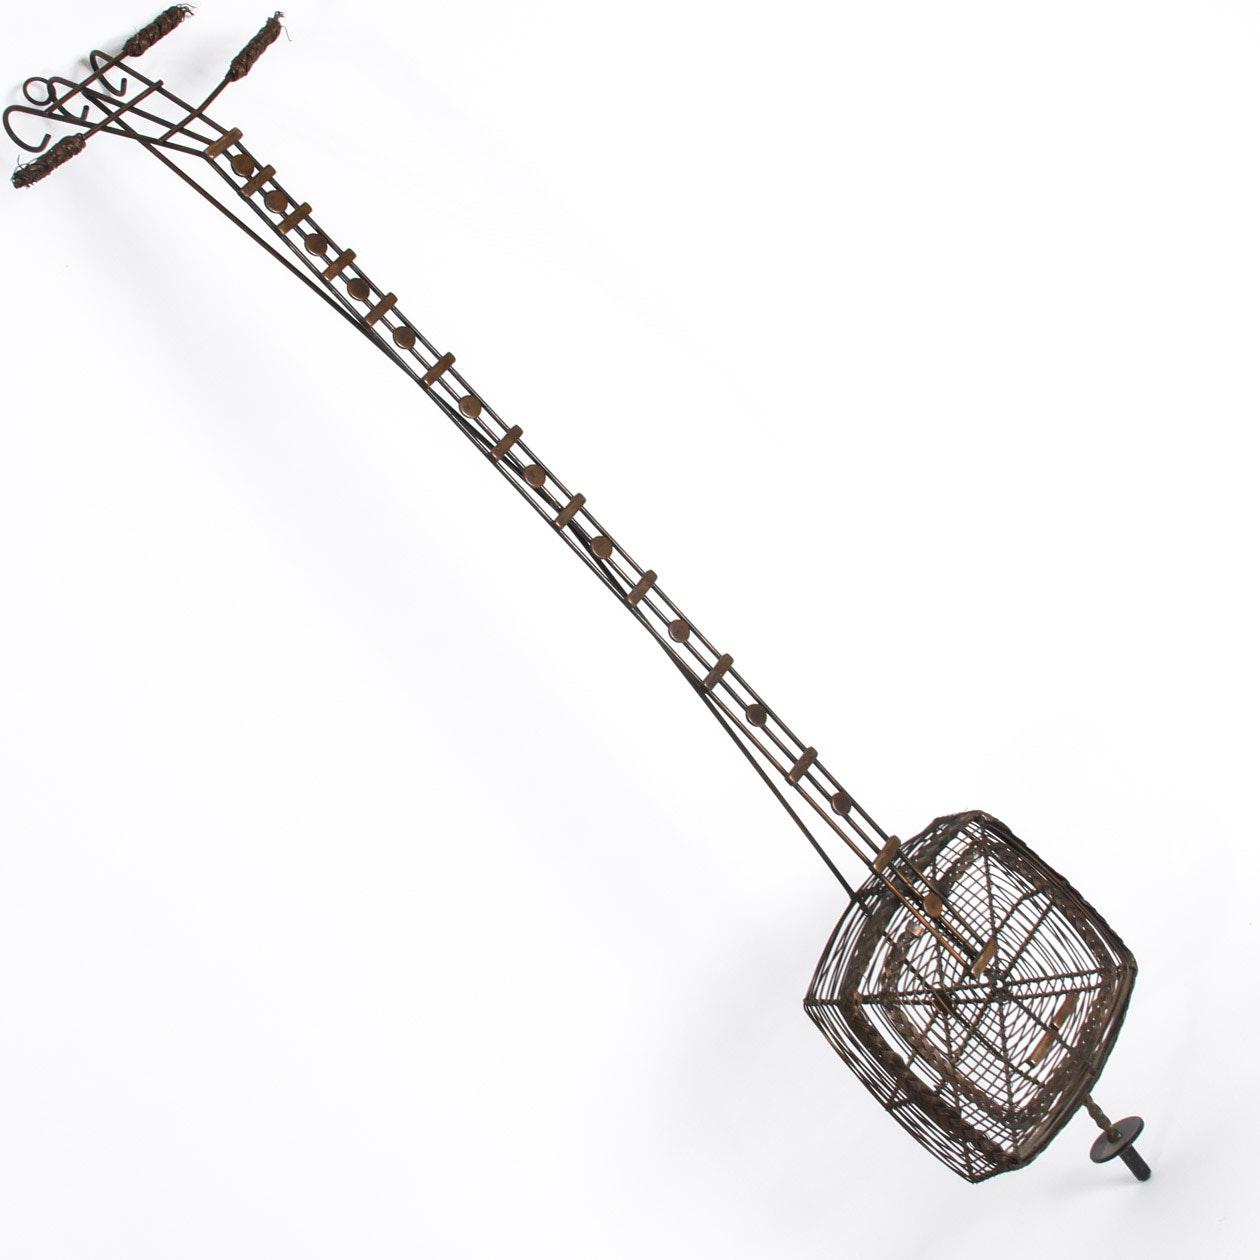 Vintage Wire Sculpture of a Japanese Shamisen Instrument